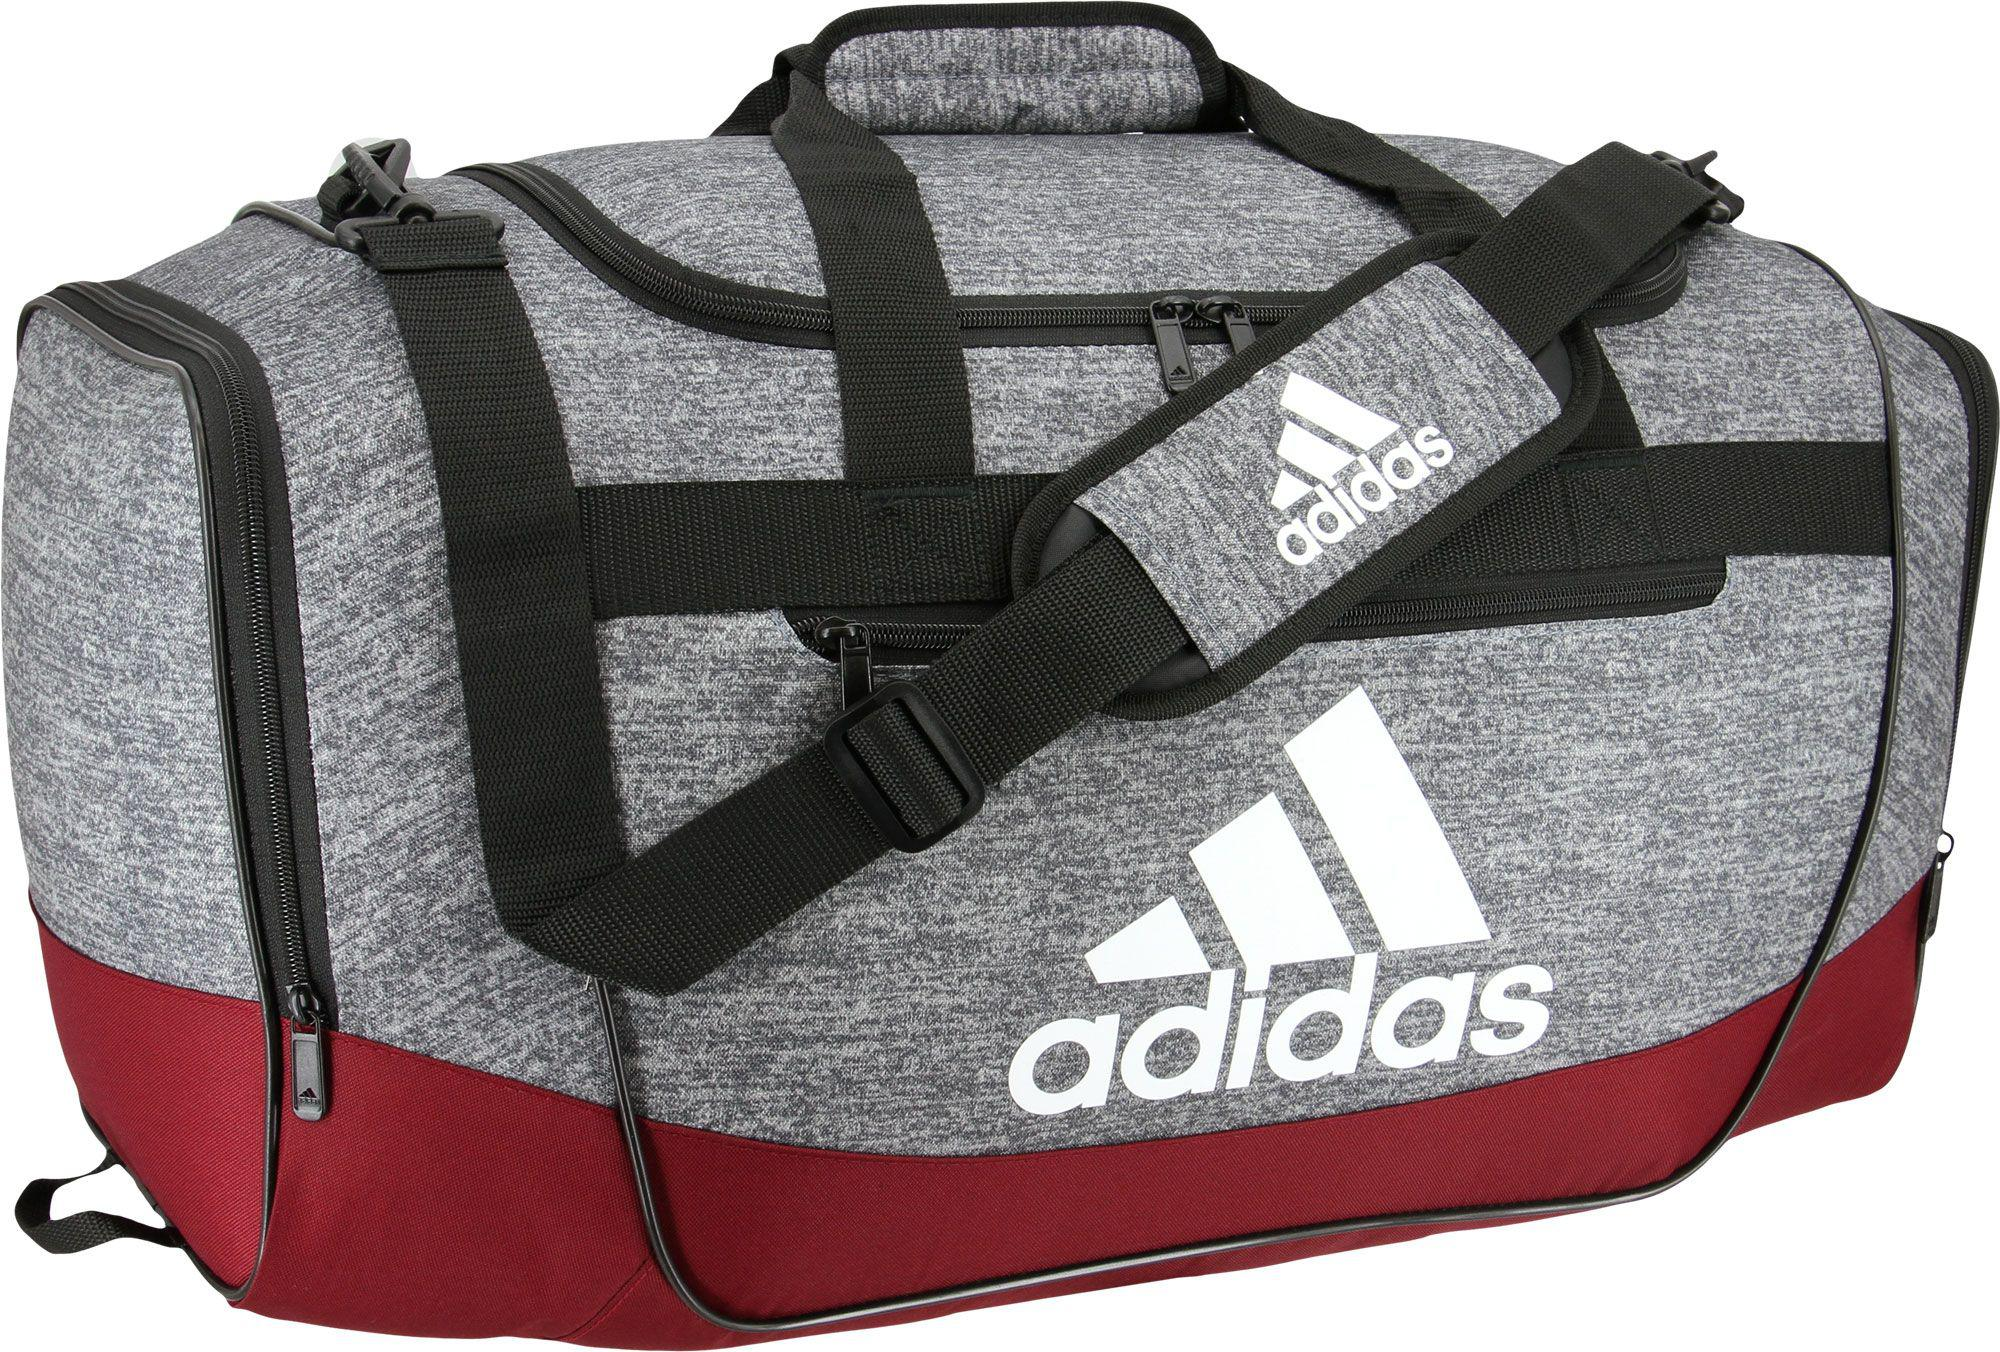 Lyst - adidas Defender Iii Medium Duffle Bag in Gray for Men 178f4e242a348